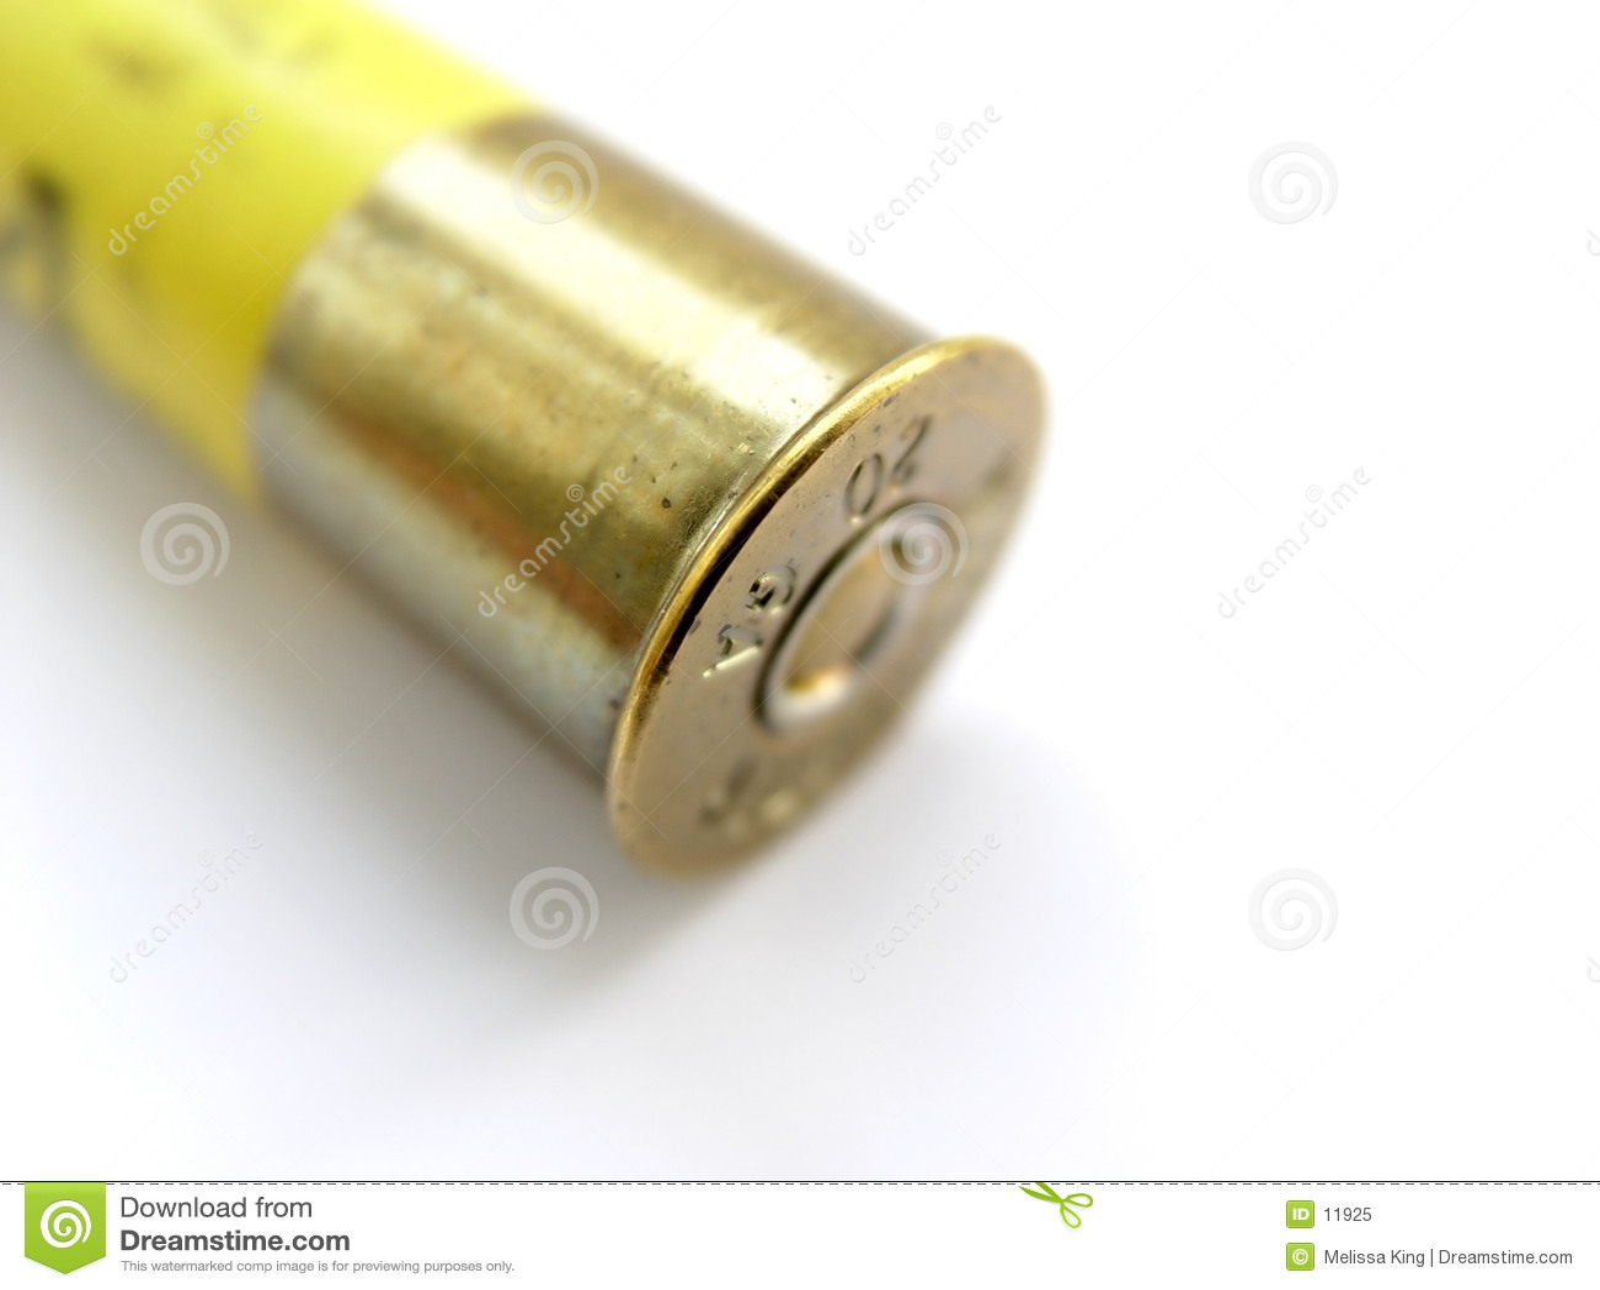 Remboursement in fine jaune